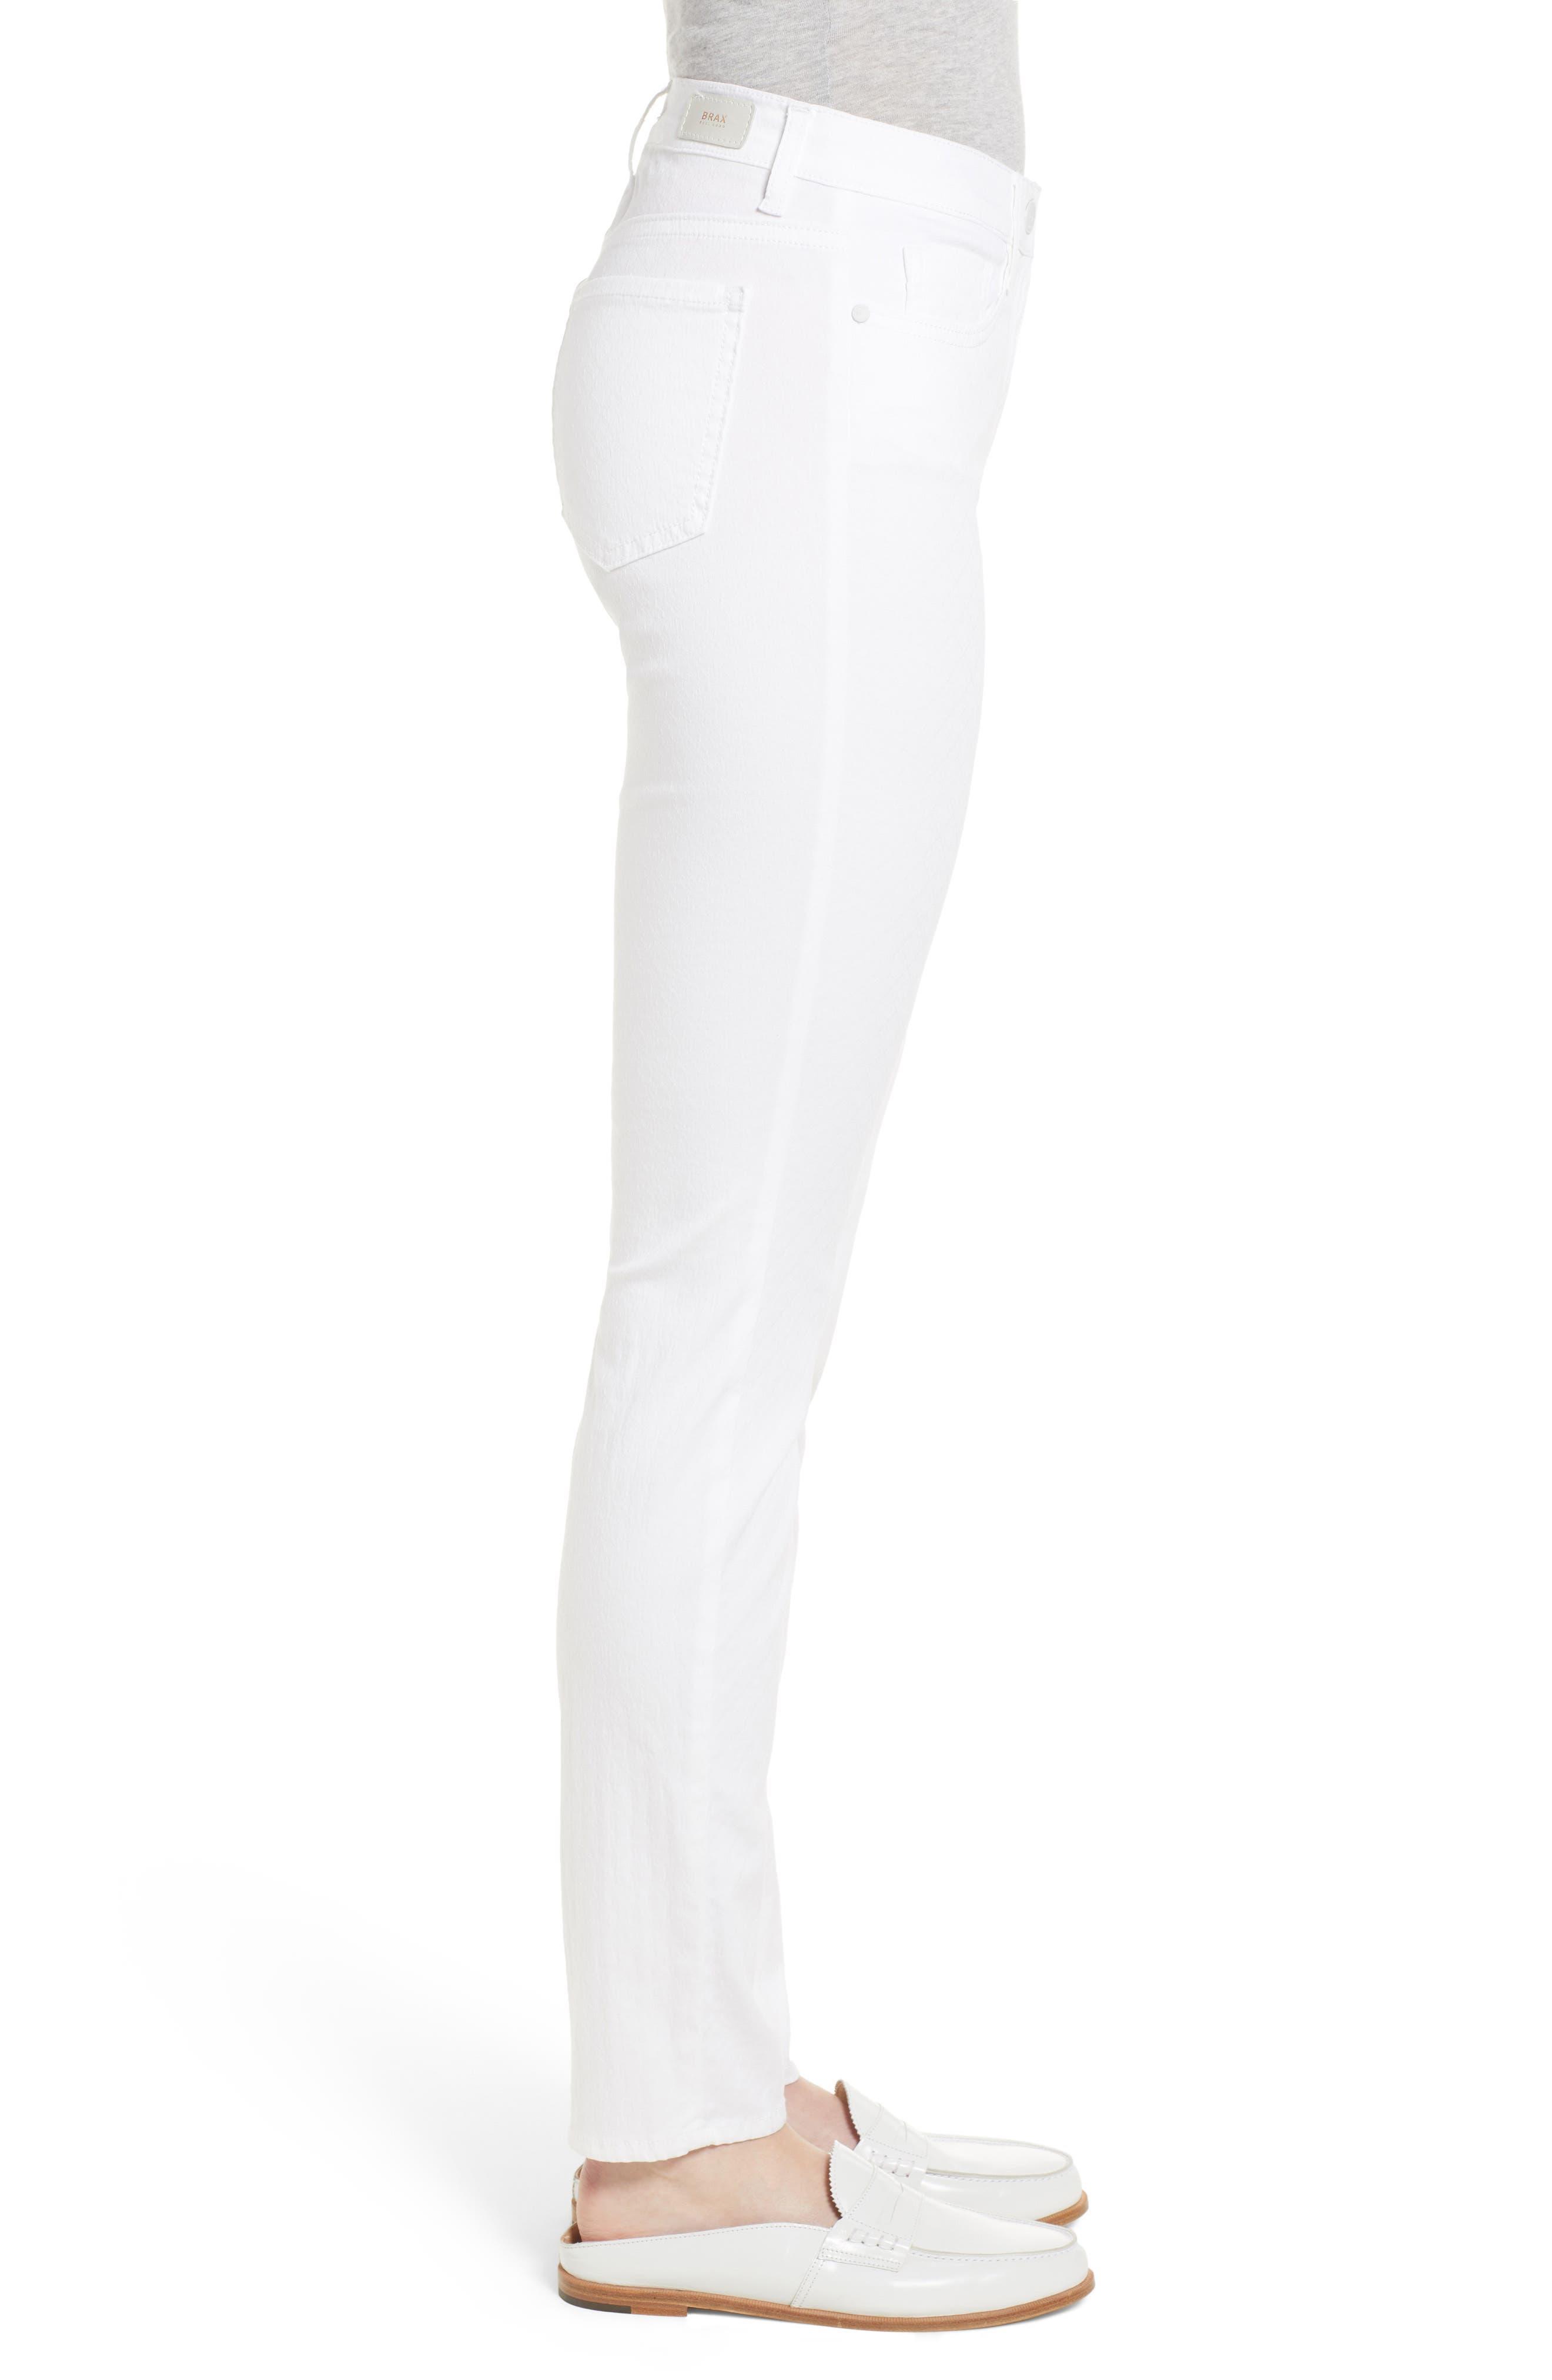 Shakira White Jeans,                             Alternate thumbnail 3, color,                             White